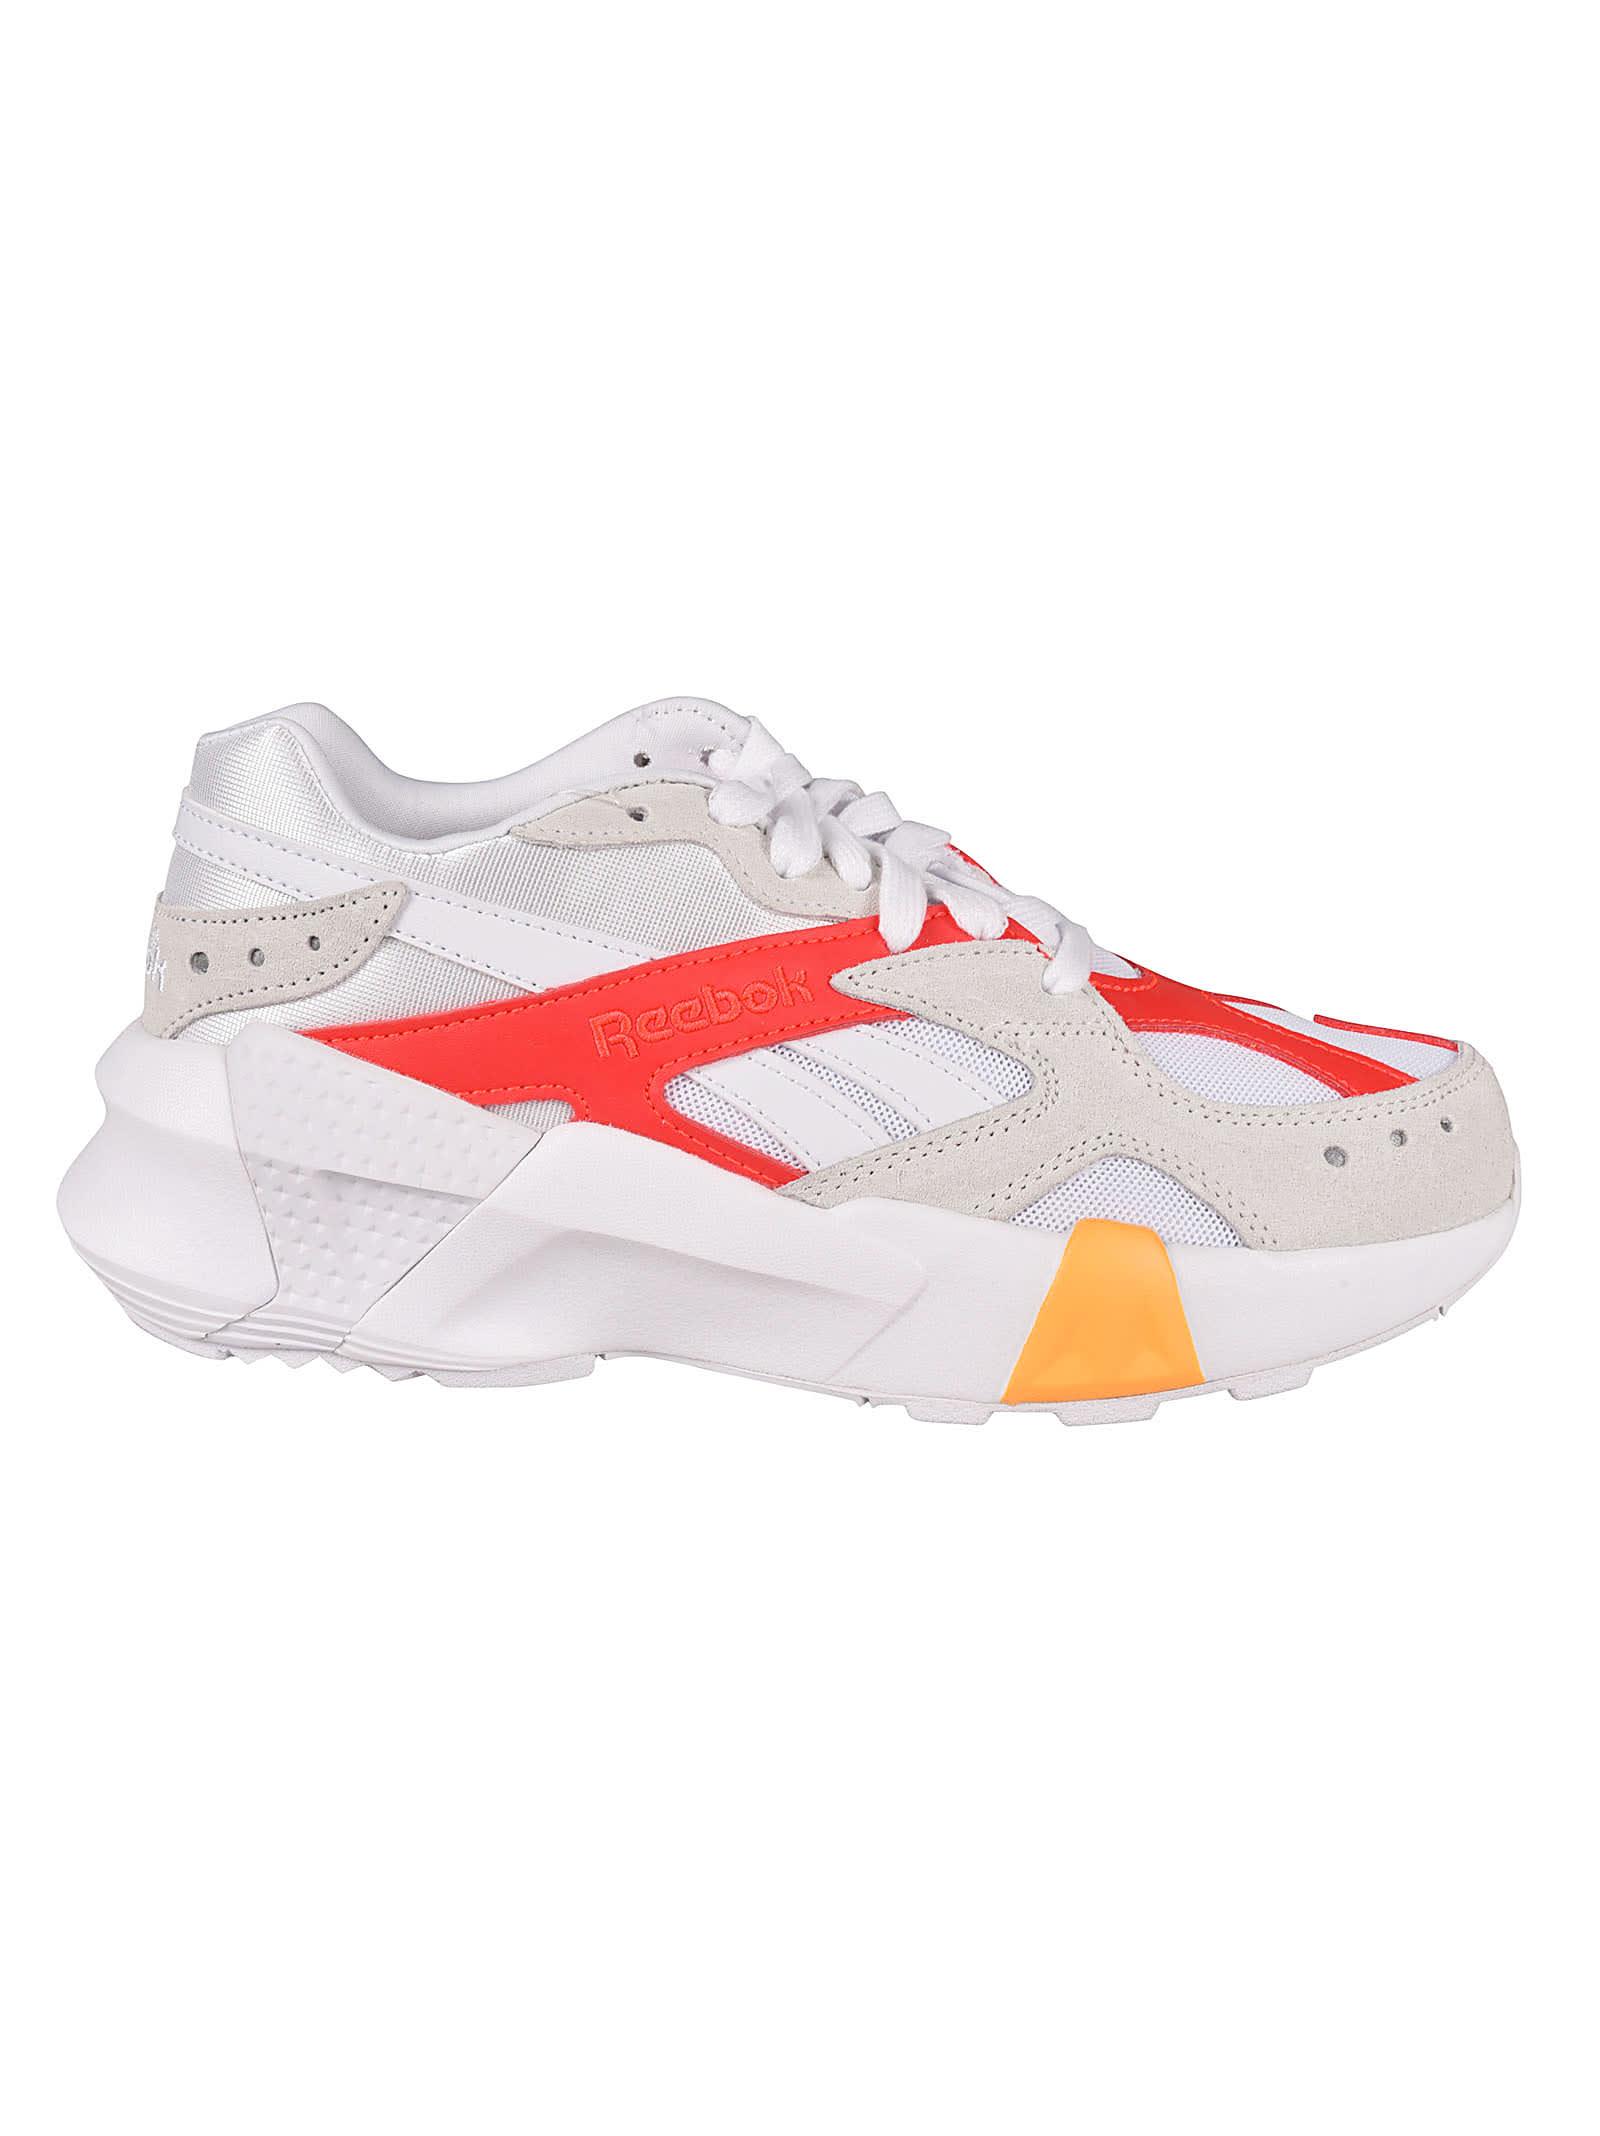 894fa0b4e4 Reebok Aztrek Double X Gigi Hadid Sneakers